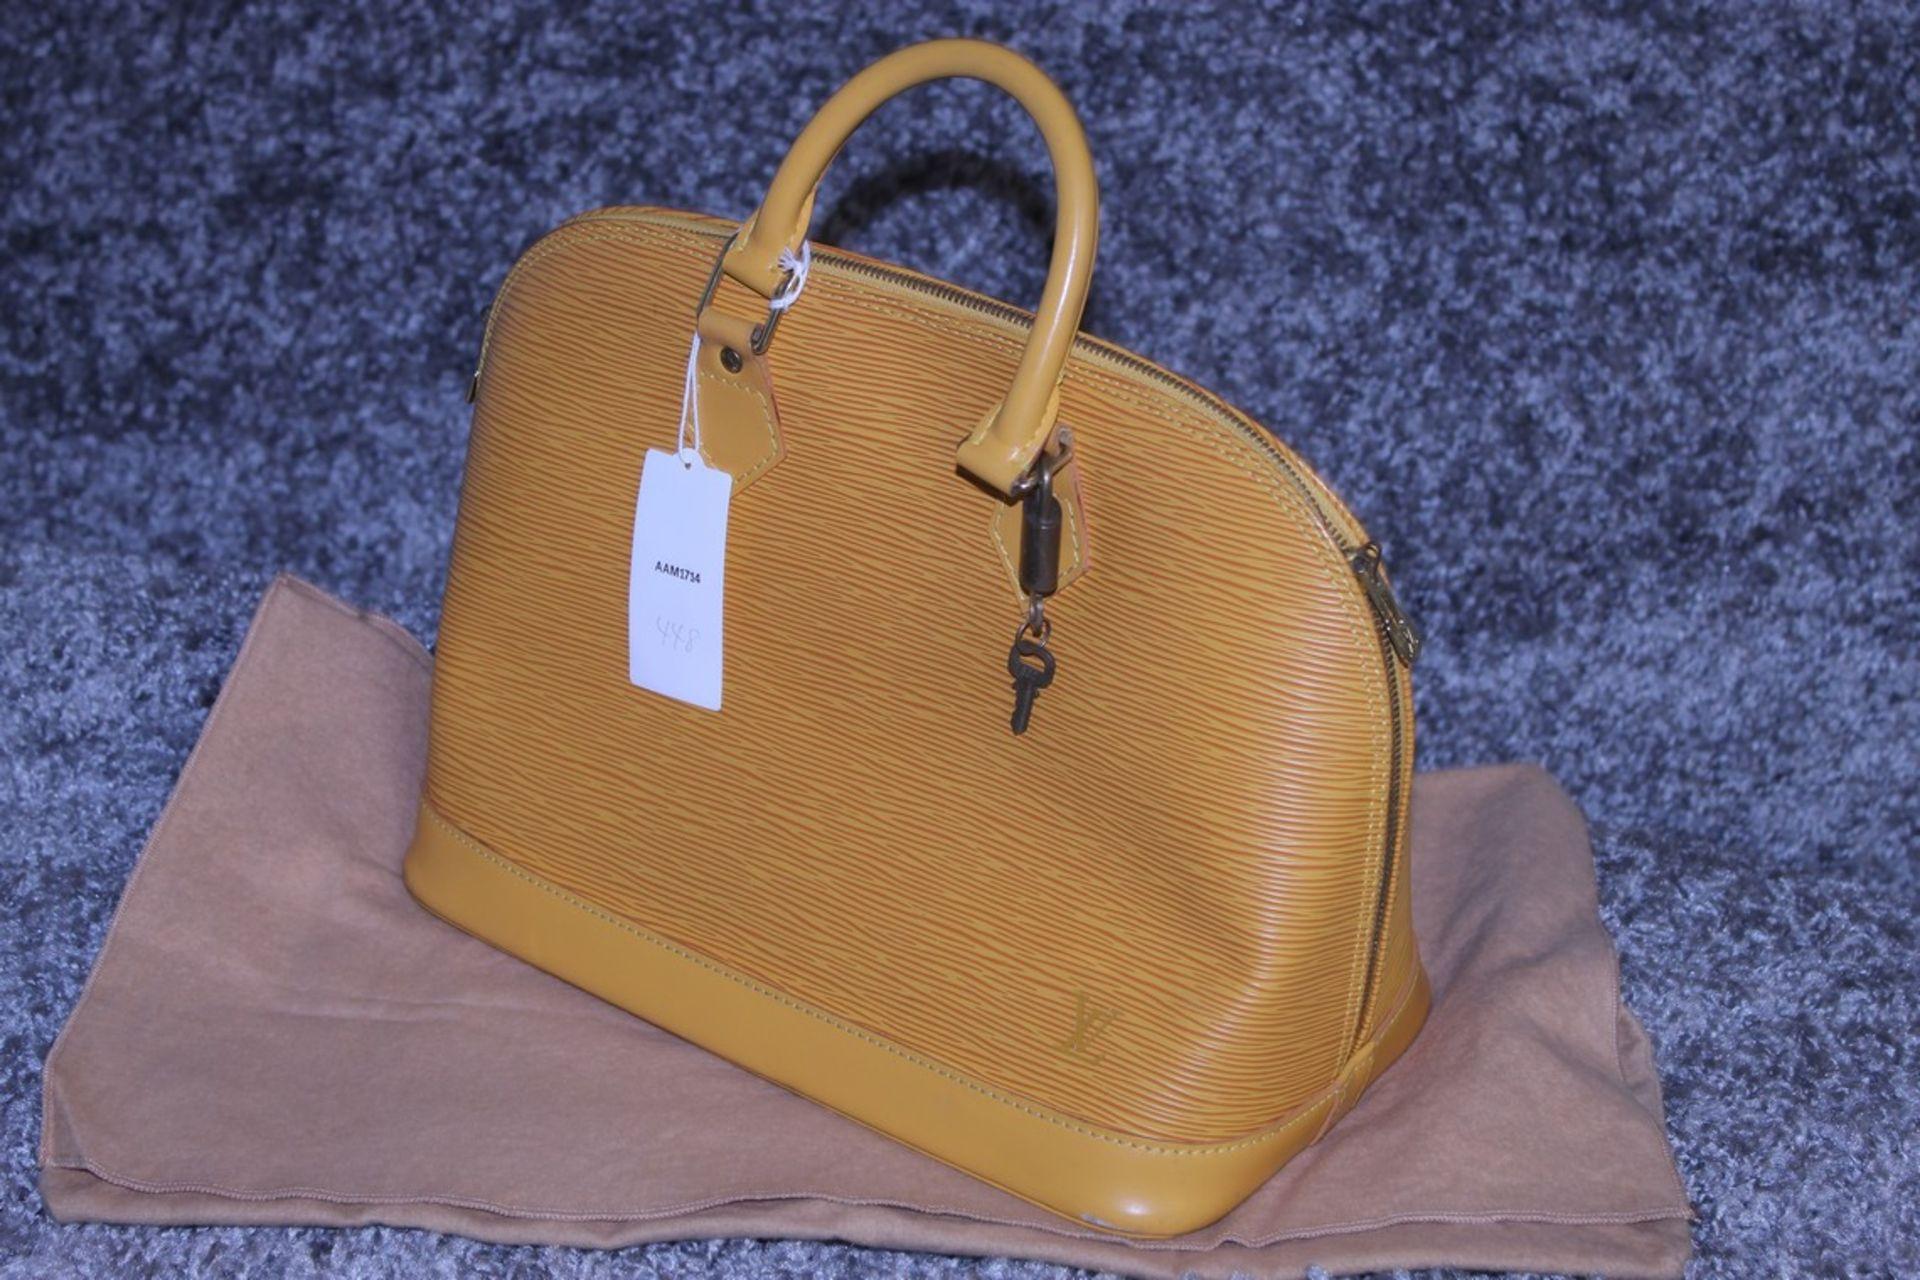 RRP £1,700 Louis Vuitton Alma Yellow Calf Epi Leather Handbag, Complete With Cadena, Keys & Dust Bag - Image 3 of 3